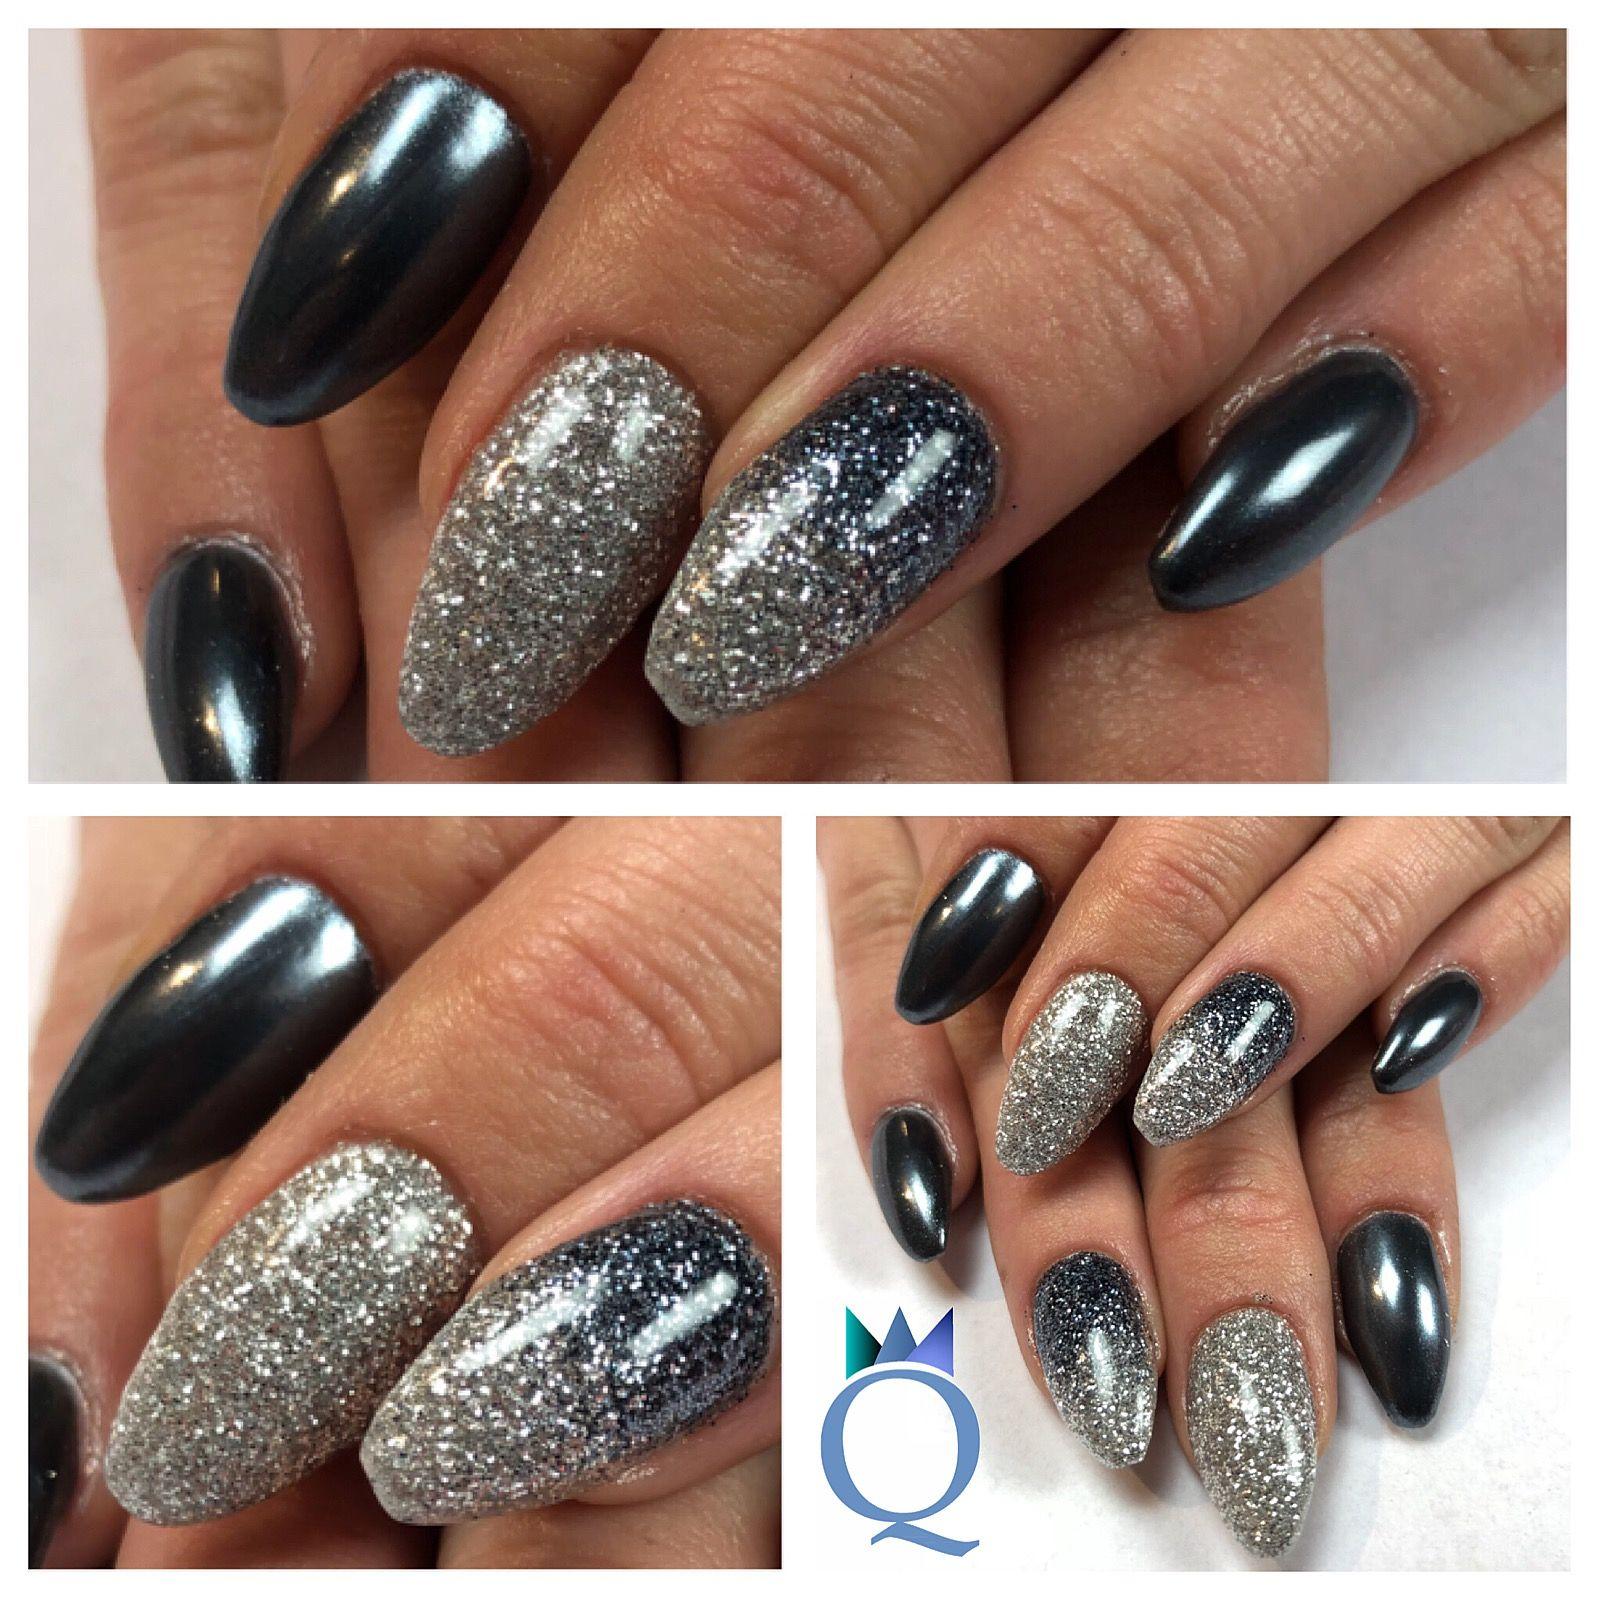 coffinnails #gelnails #nails #silver #anthracite #glitter #chrome ...